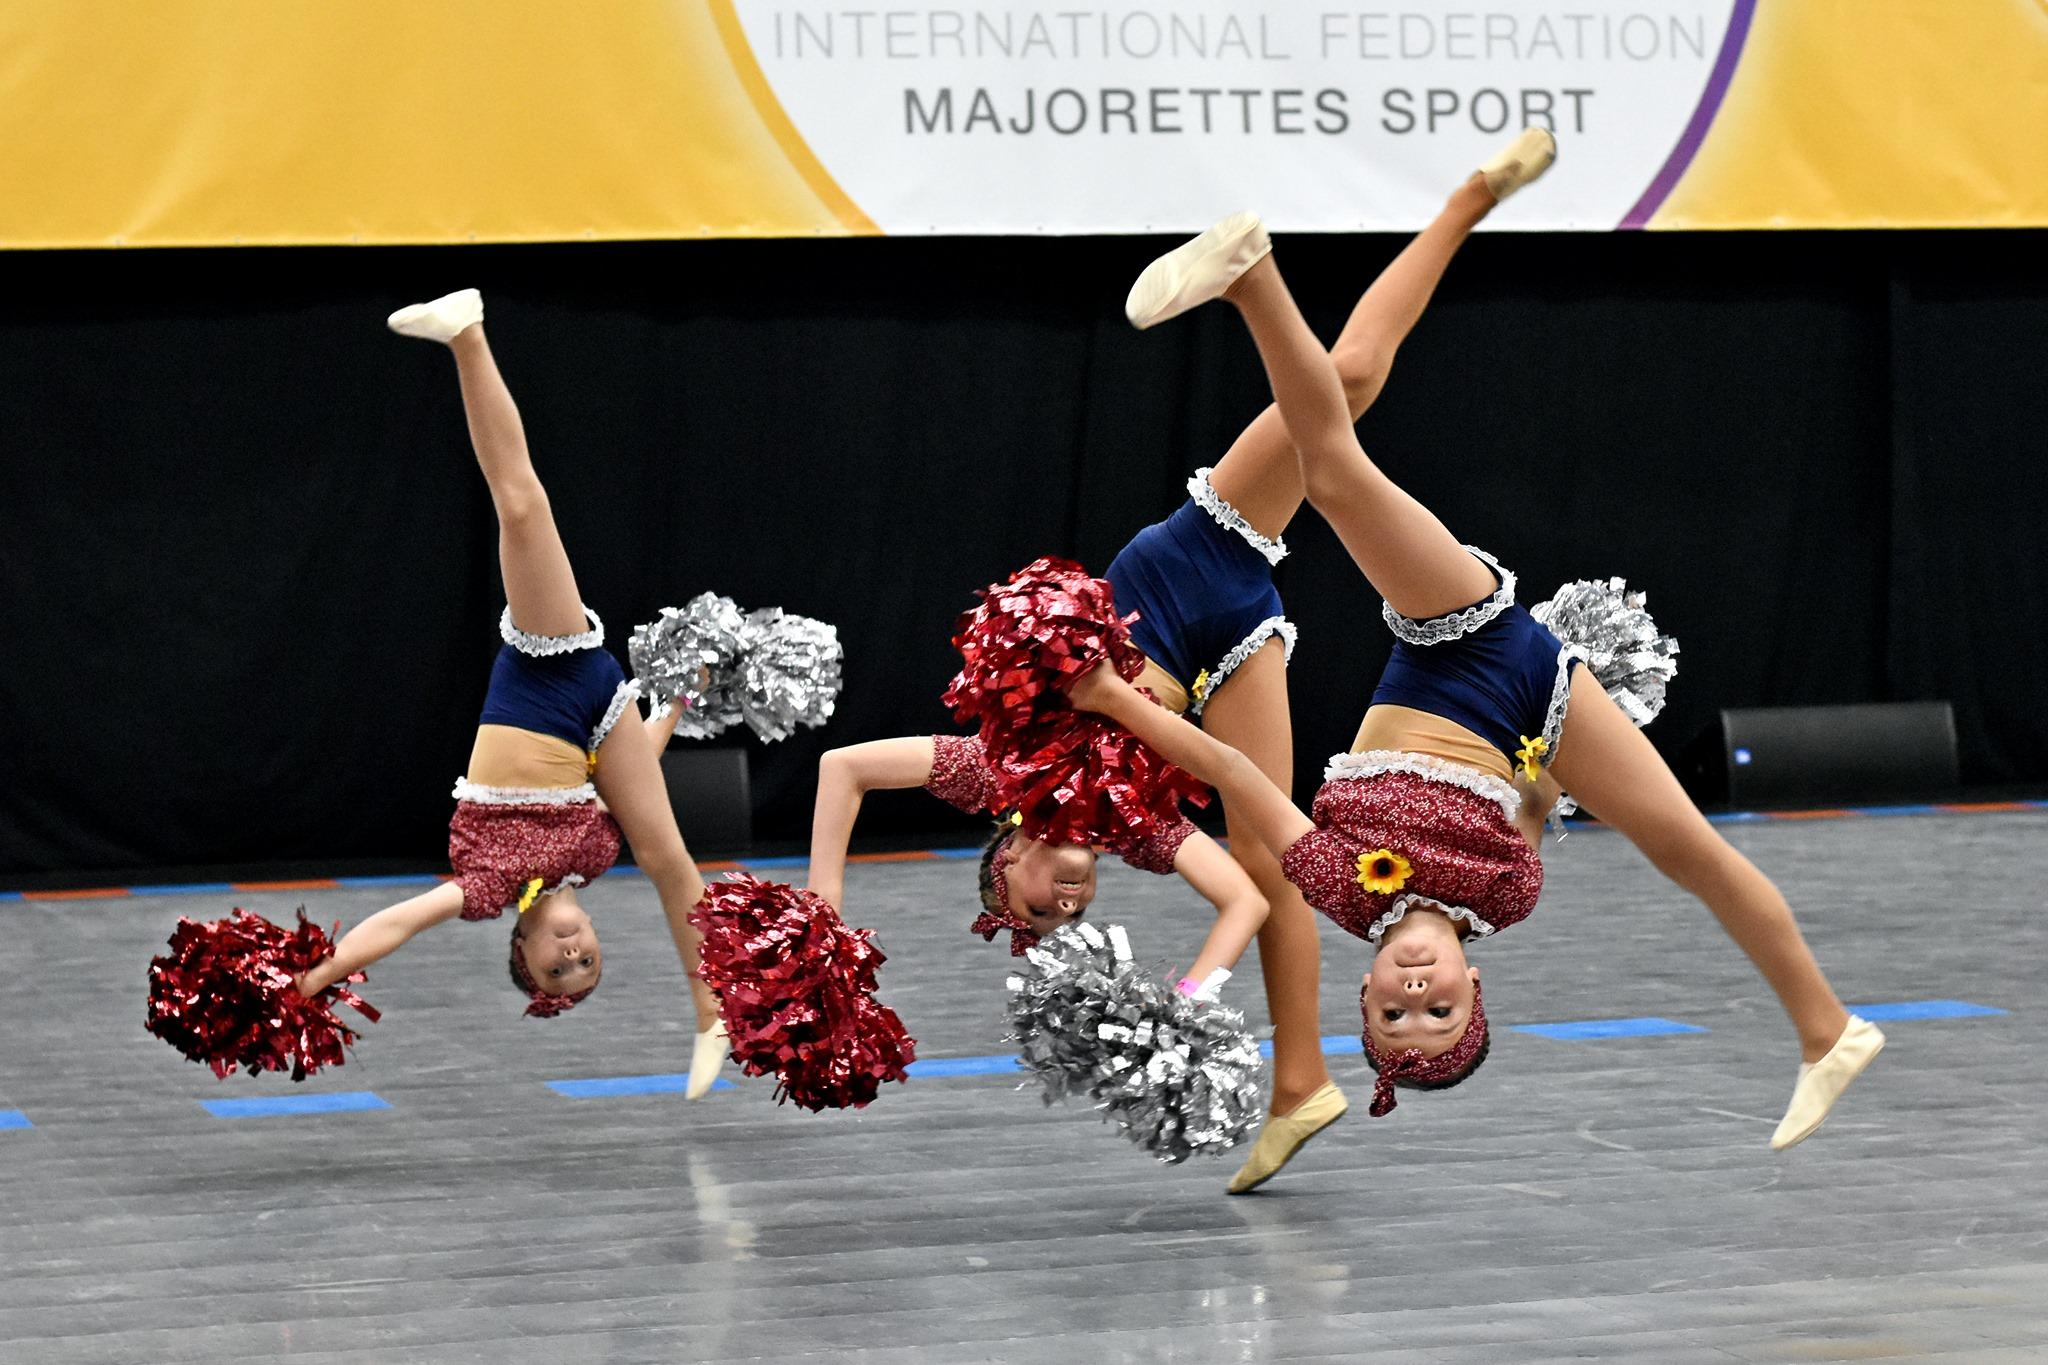 Mažoretky 4. Z Mistrovství světa v mažoretkovém sportu pro rok 2019 | Foto Zdeněk Bierhanzl